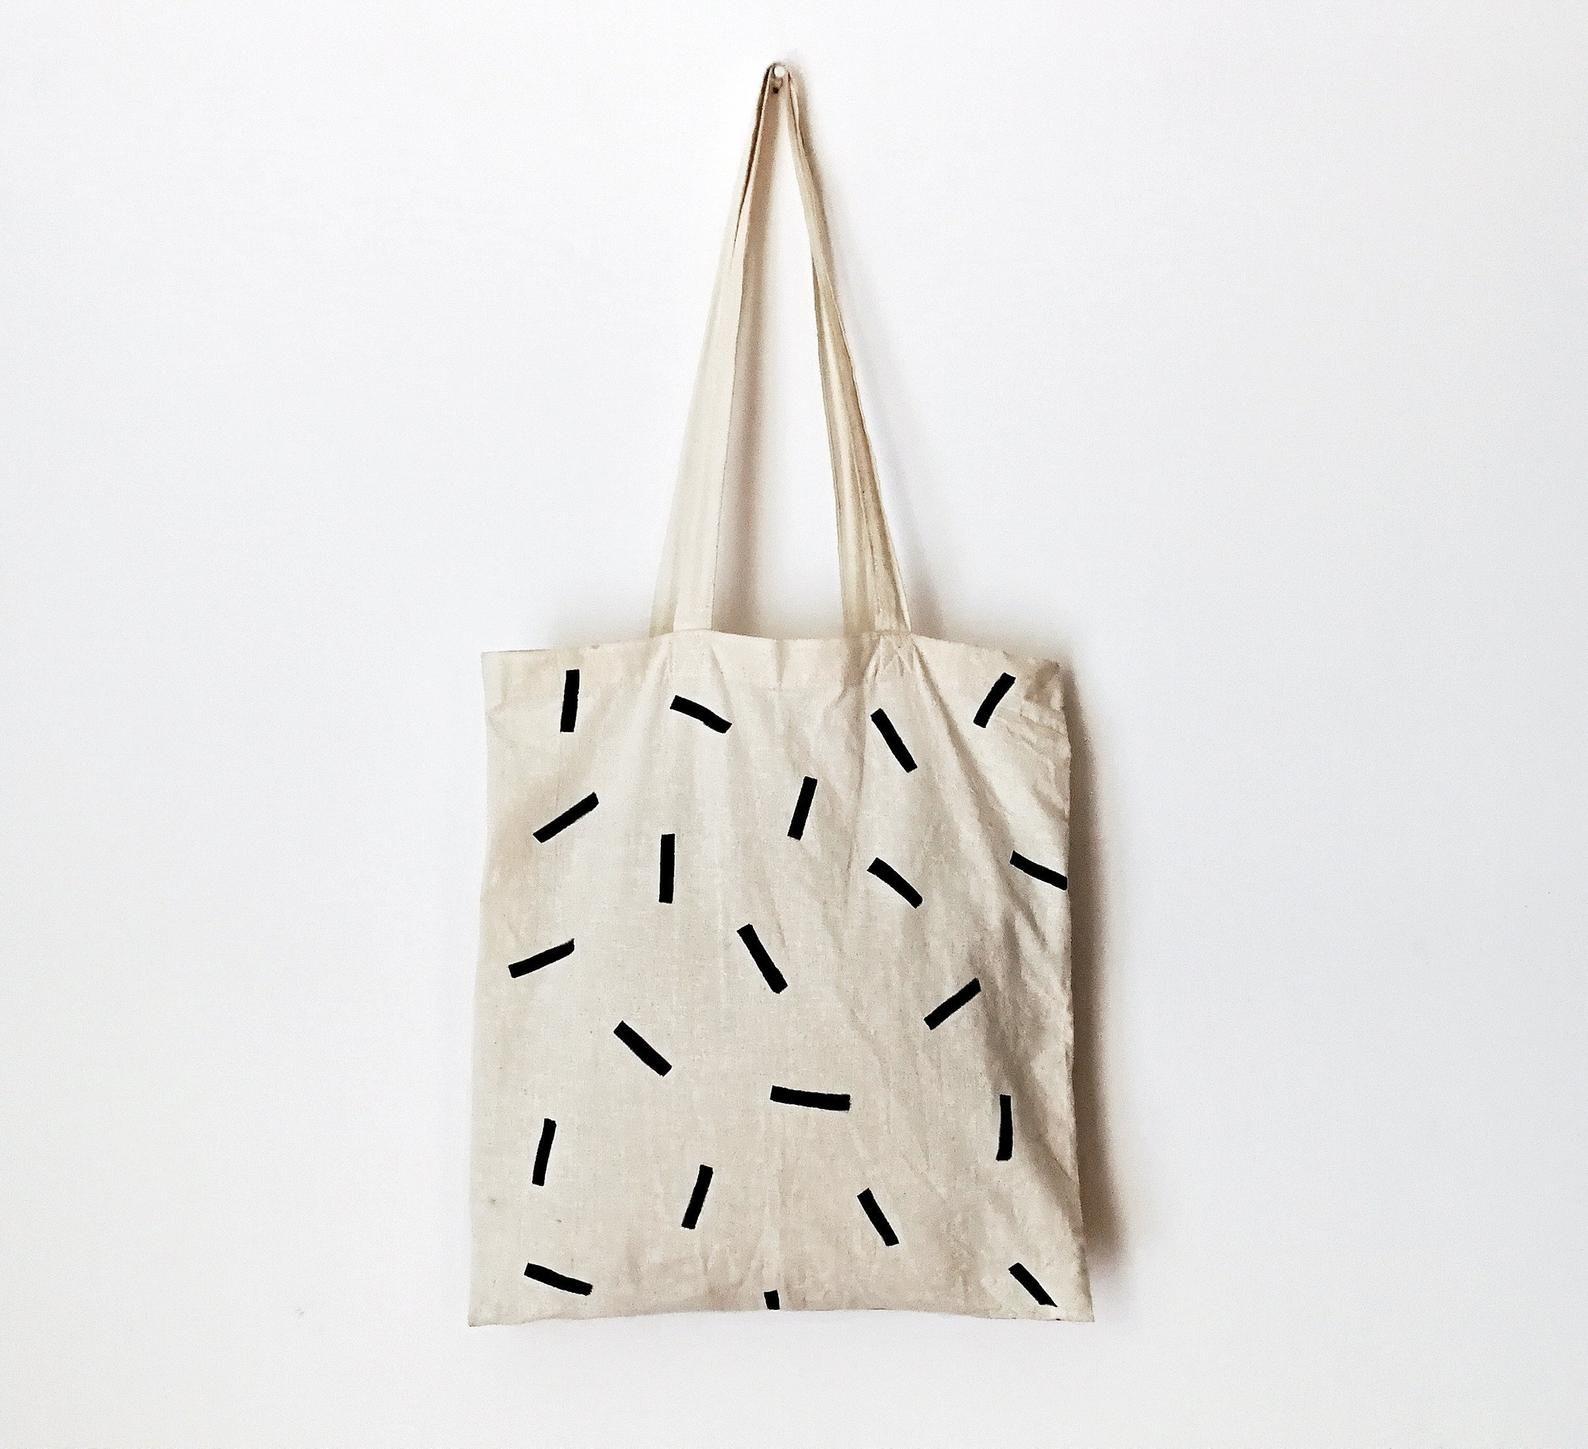 Bolsa de algodón, bolsa minimalista, lienzo natural, bolsa de lona, pintada a mano, bolsa para desechos, bolsa ecológica, compras, bolsa pintada a mano